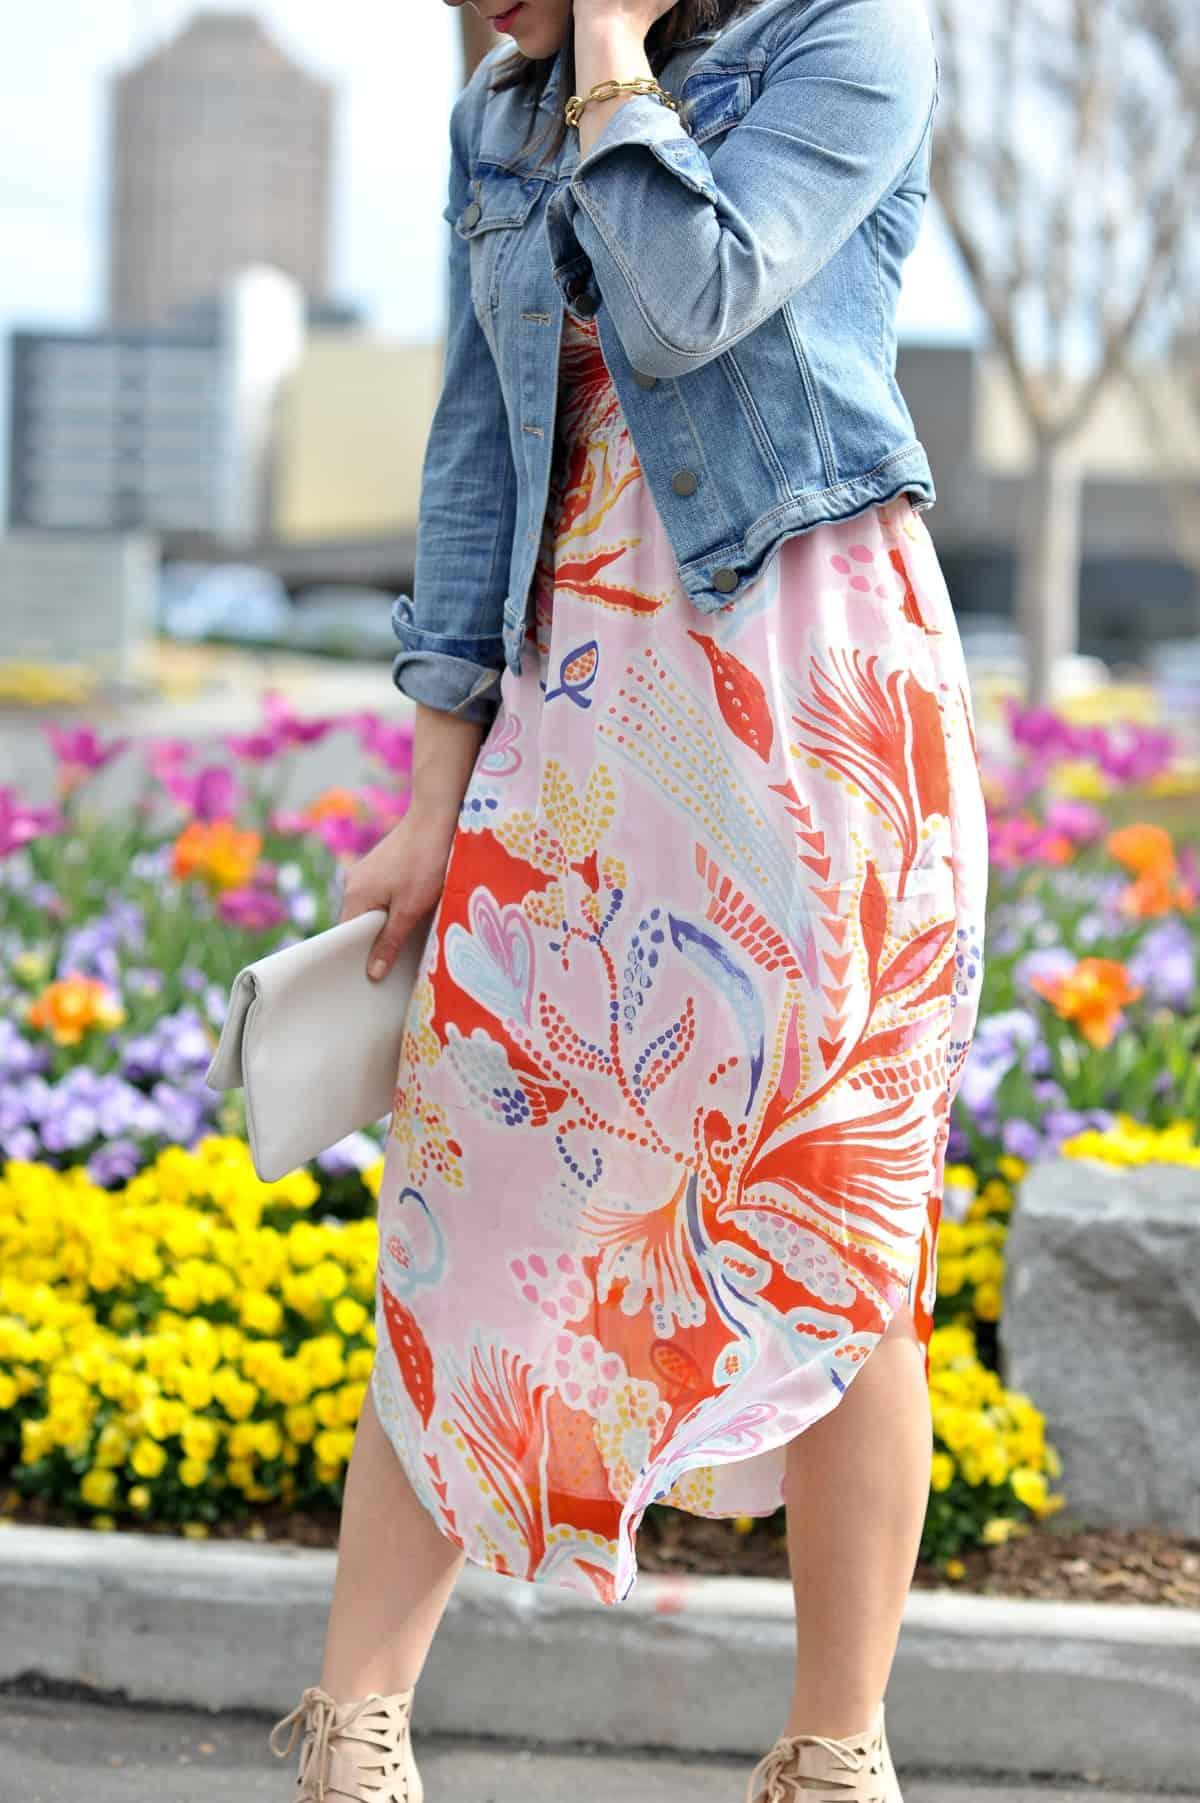 Banjanan Cochella Dress - printed floral dress for summer - My Style Vita - @mystylevita - 13